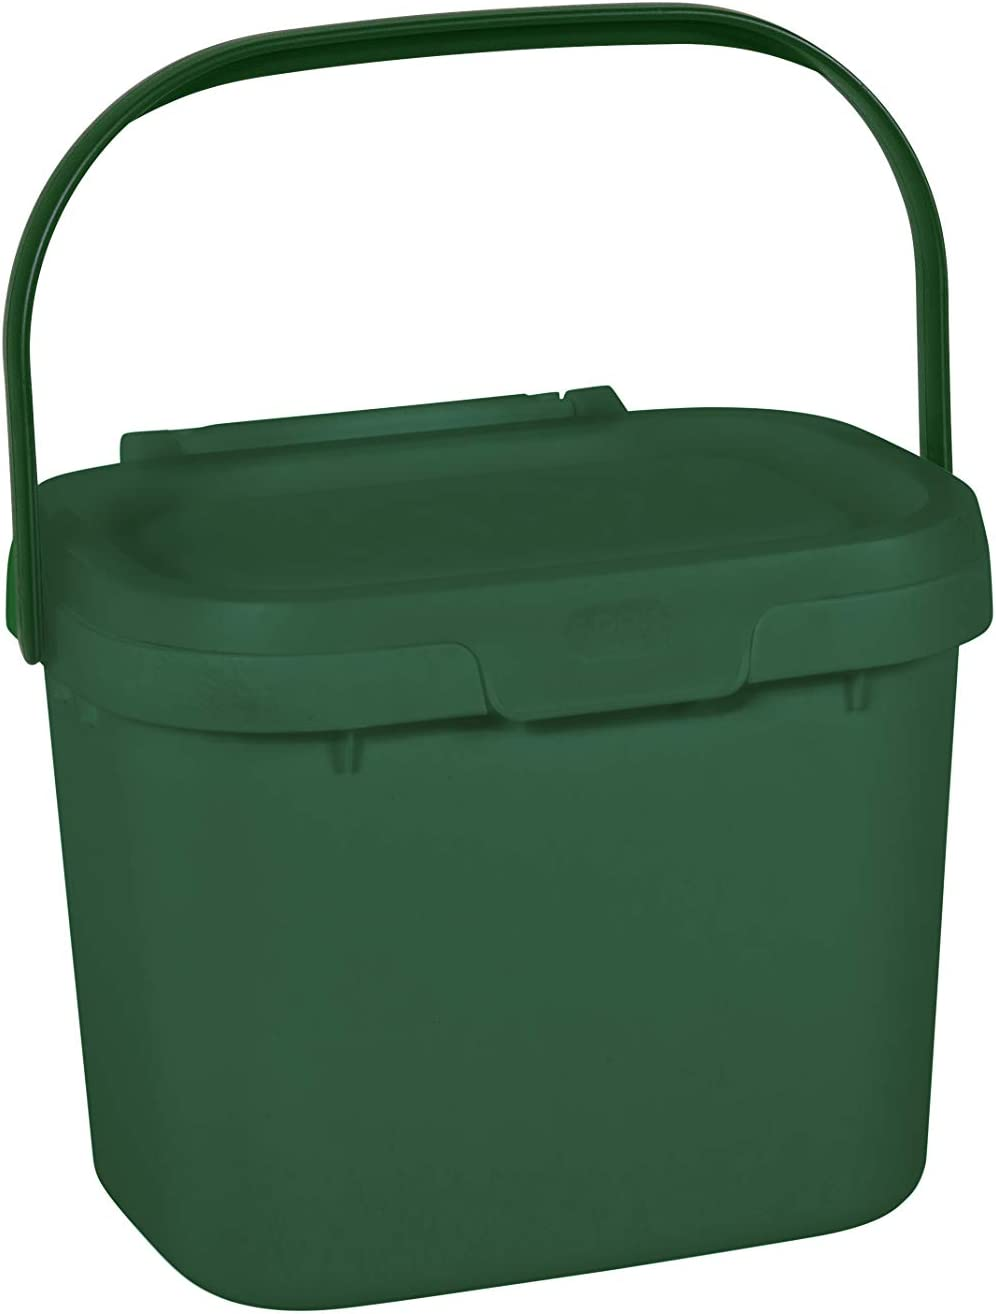 Addis 518250 Everyday Kitchen Food Waste Compost Caddy Bin